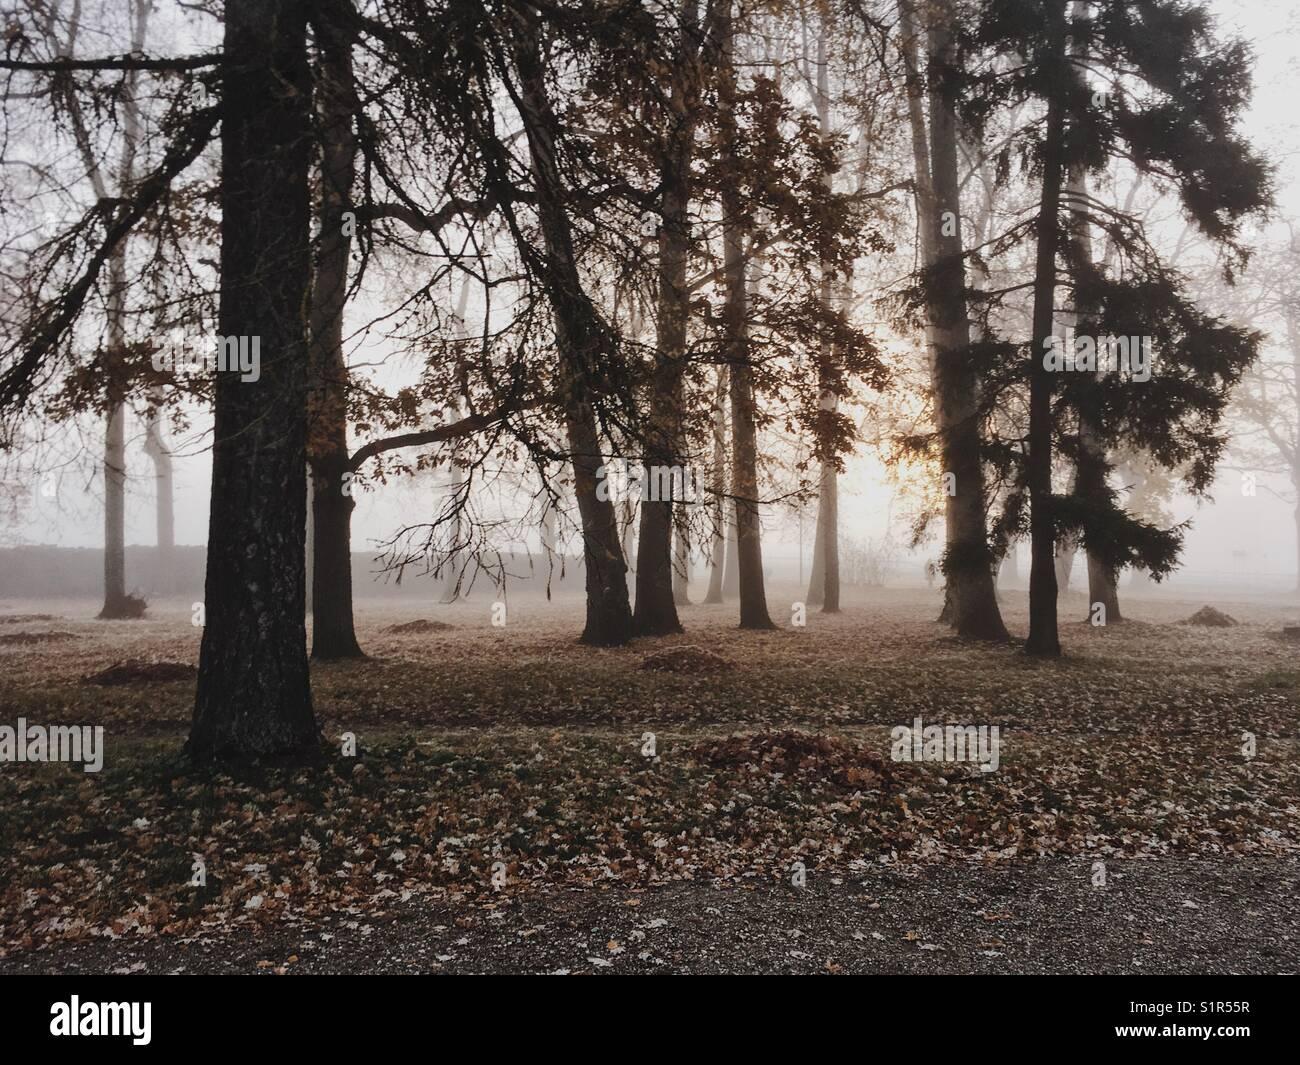 Morning sunrise through the trees. - Stock Image